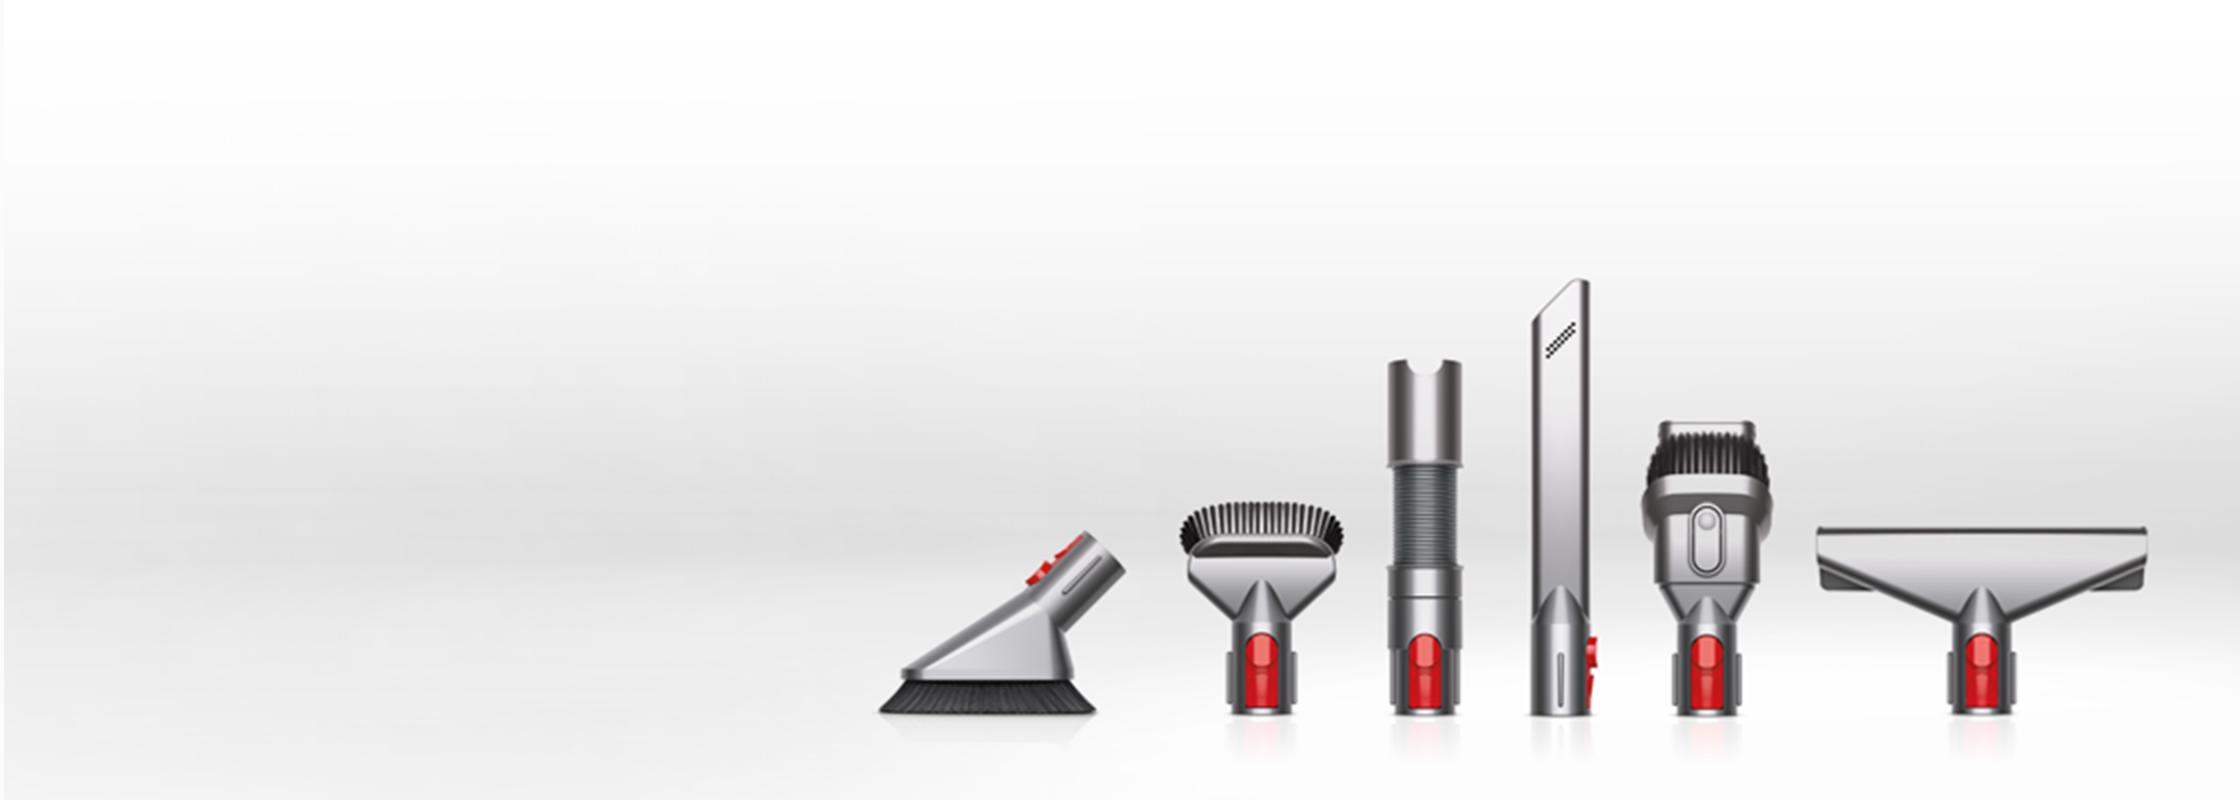 Dyson Tools